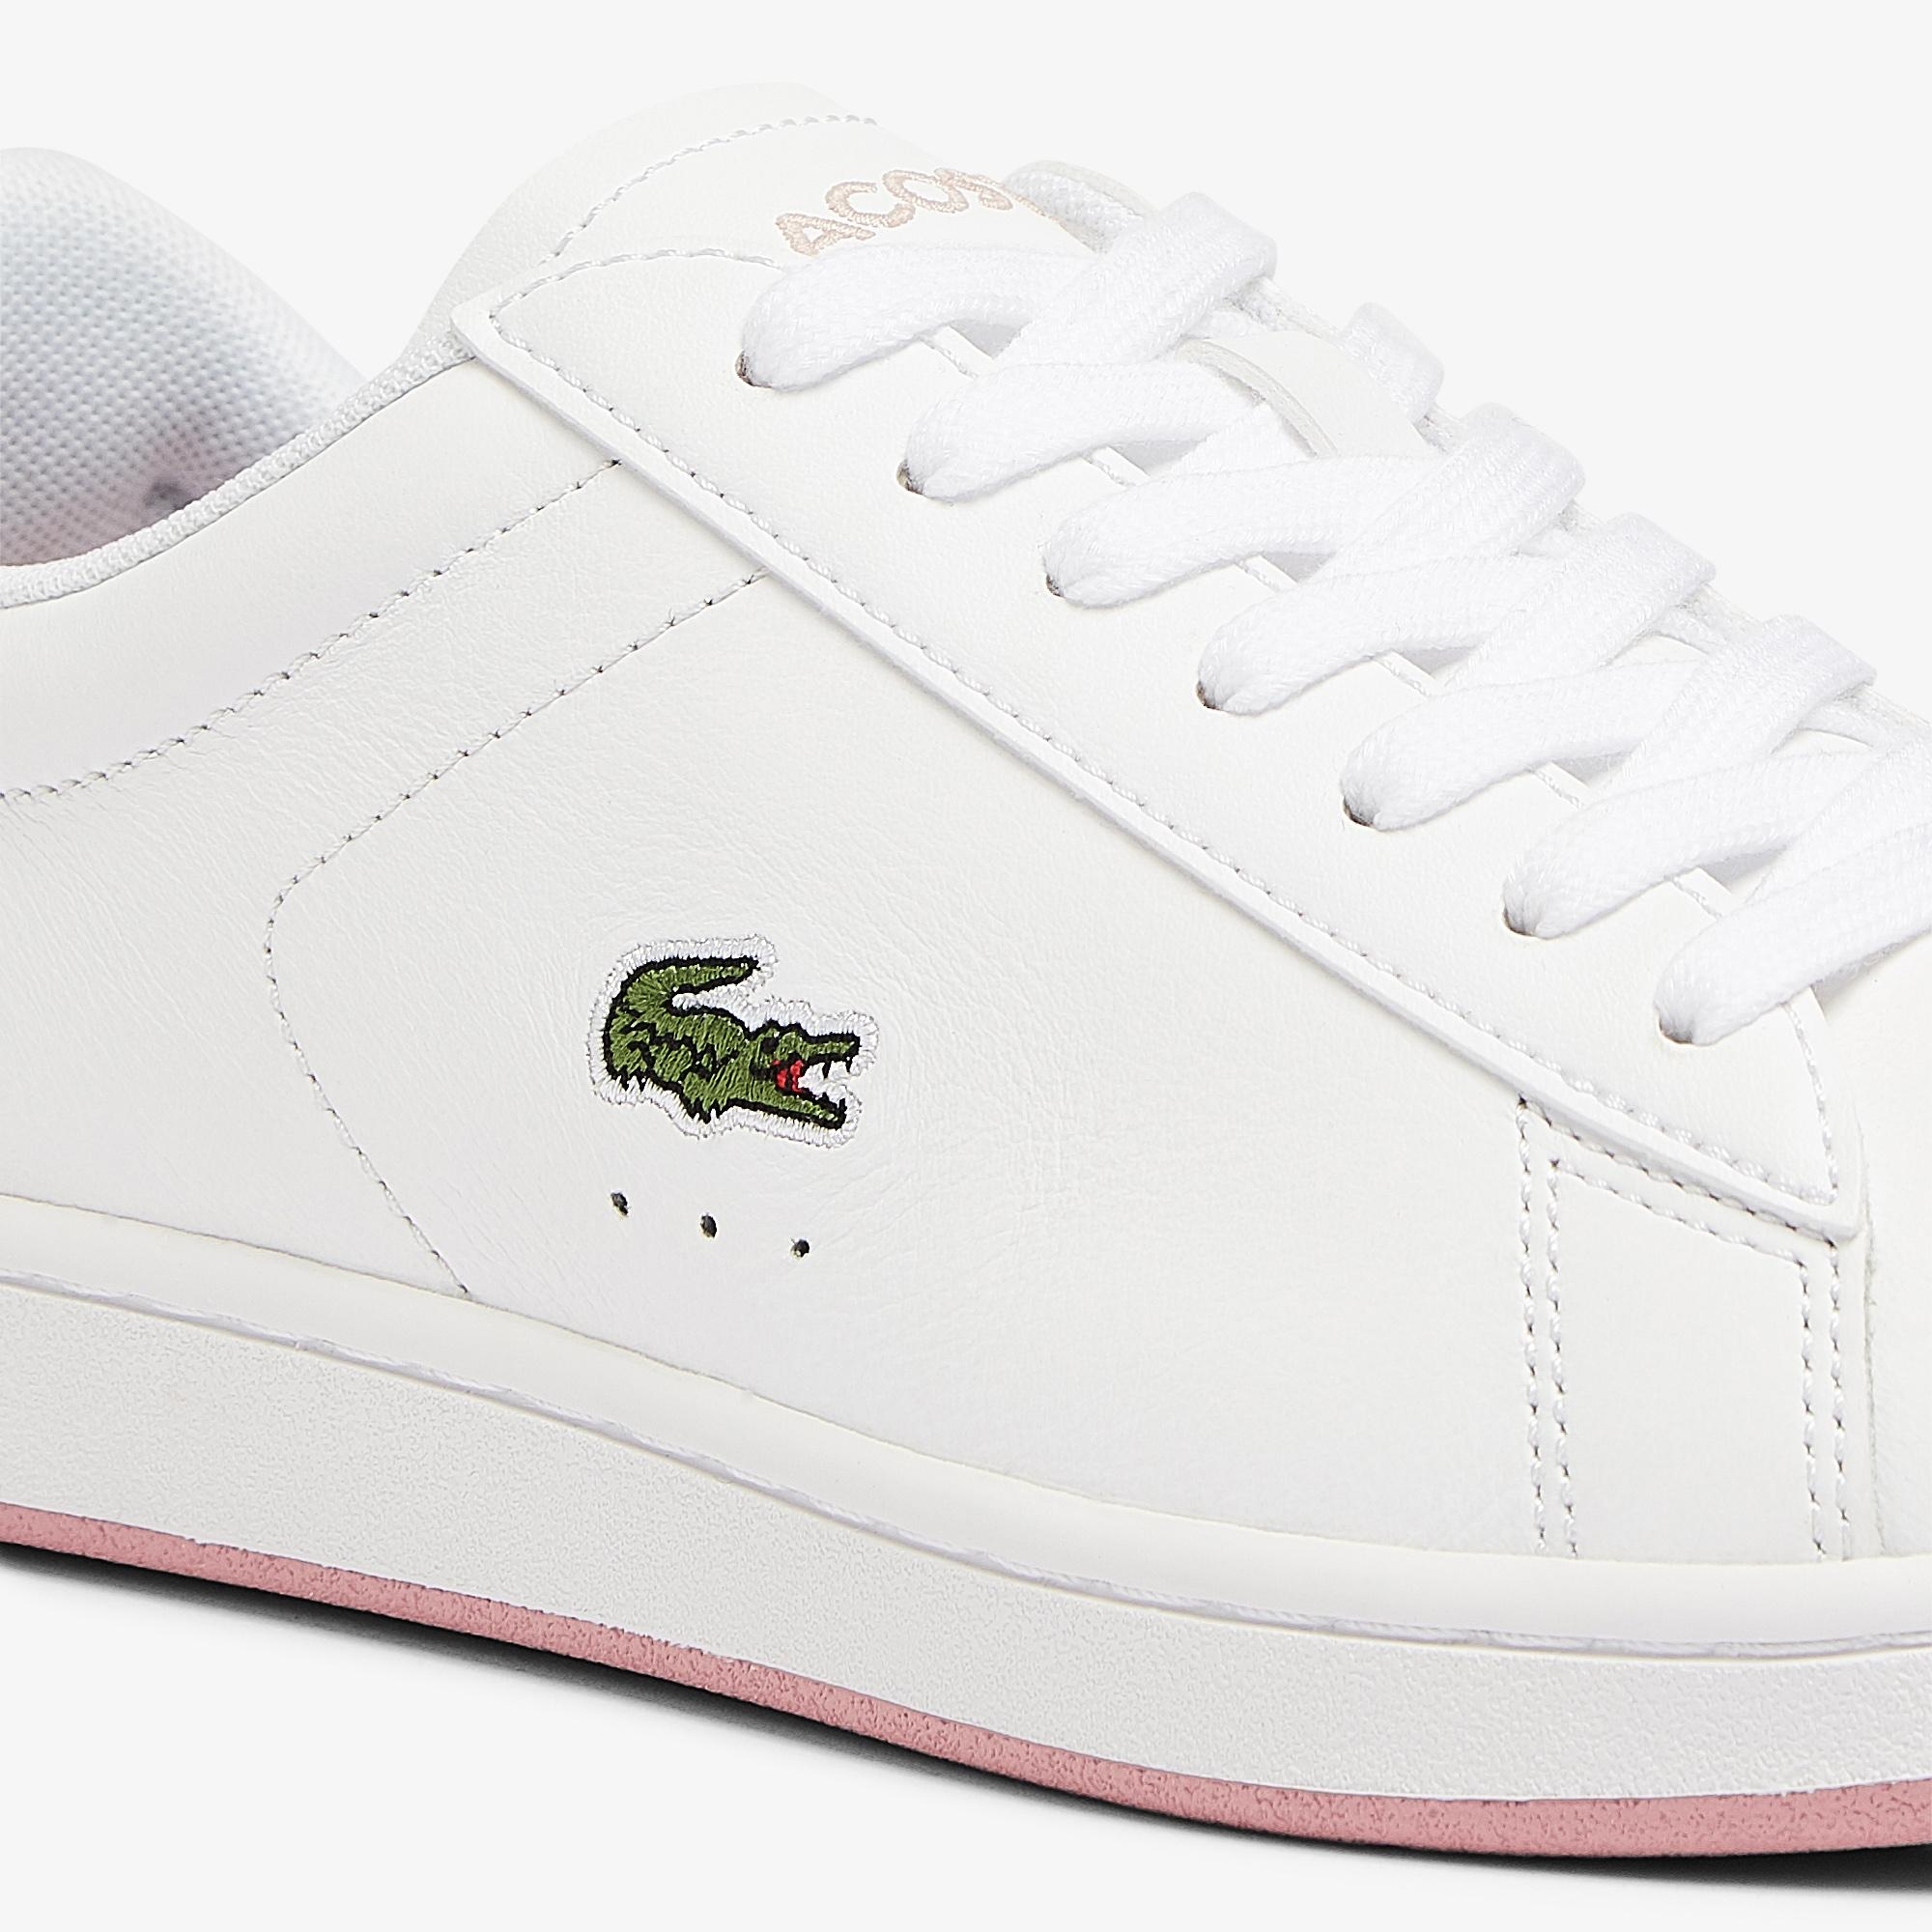 Lacoste Women's Carnaby Evo 0721 2 Sfa Shoes